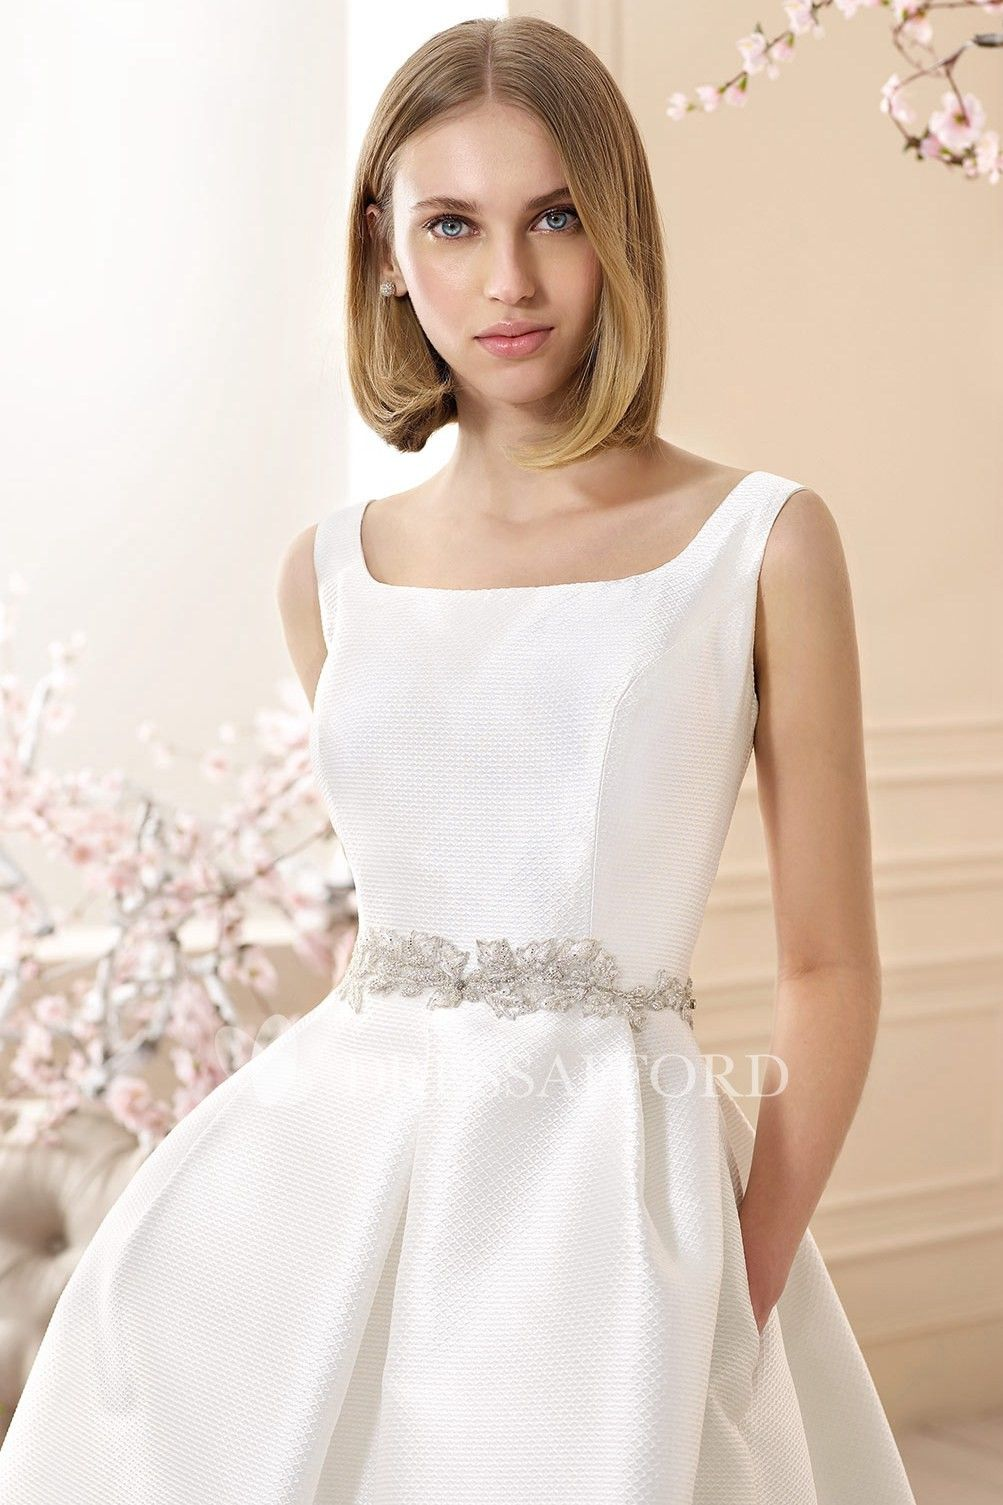 39++ Square neck wedding dress for sale information